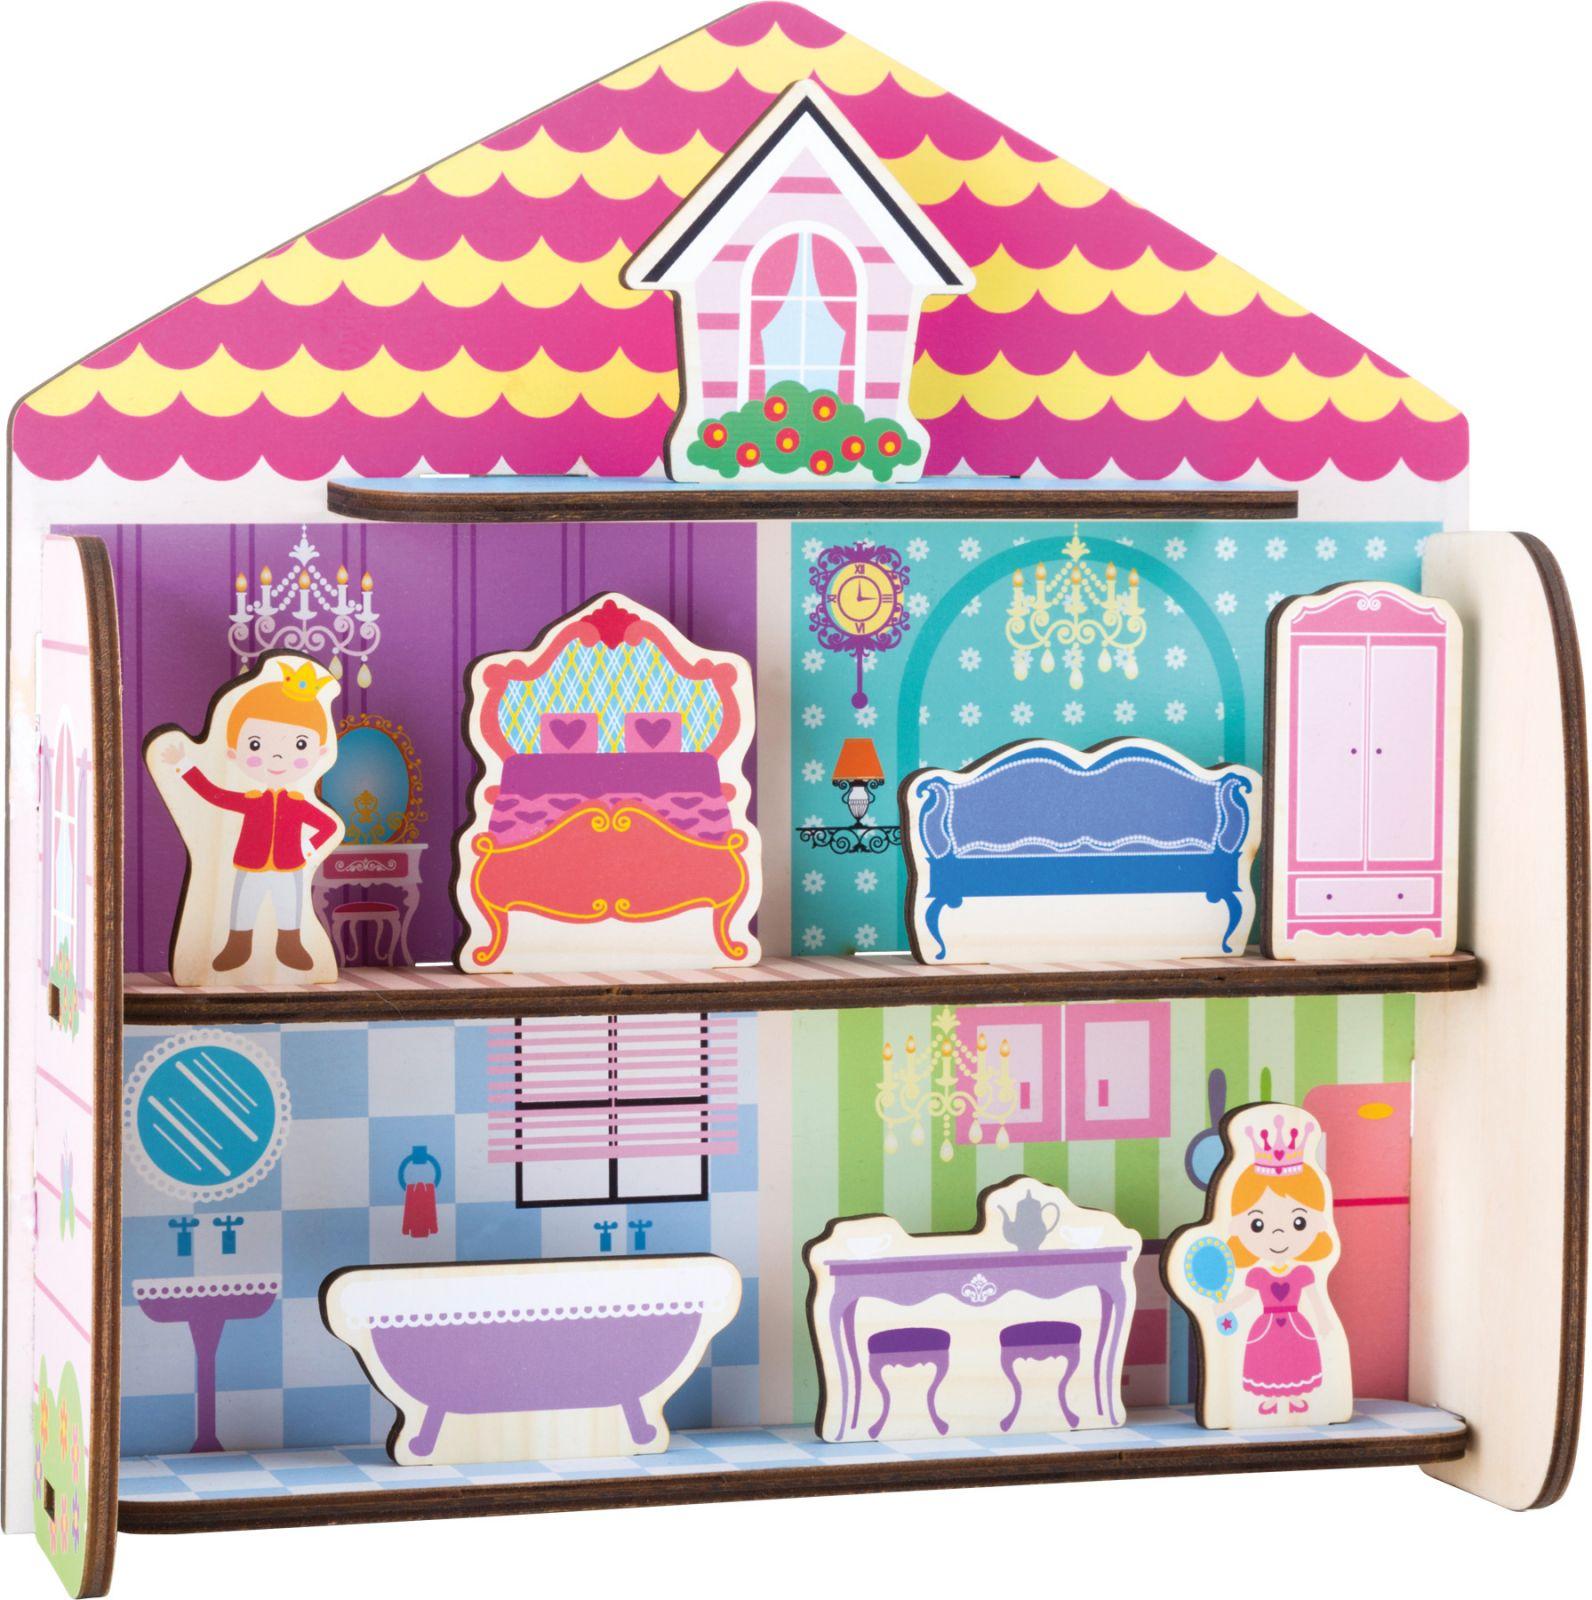 Dřevěné hračky Small Foot Dřevěná skládačka pohádkový dům Small foot by Legler